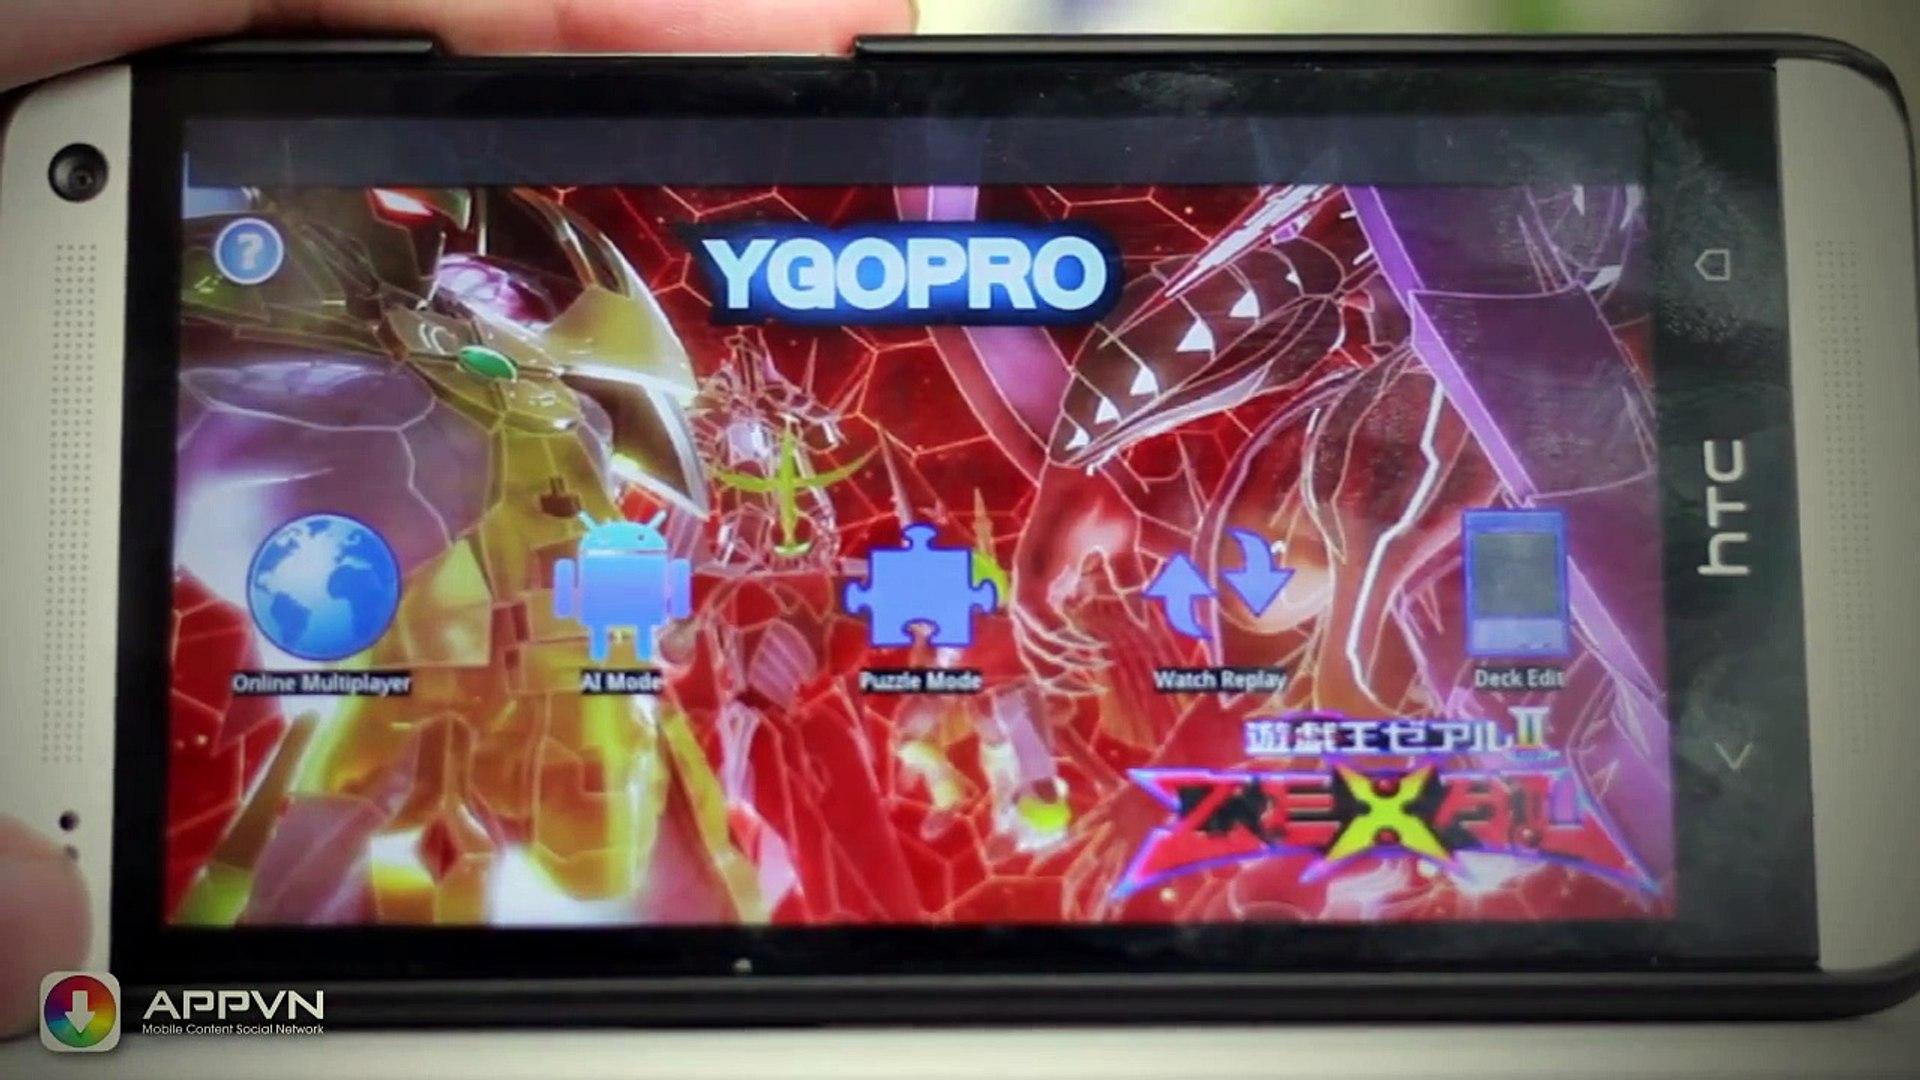 [Android Game] Ygopro - game thần bài Yugi duy nhất trên Android - AppStoreVn